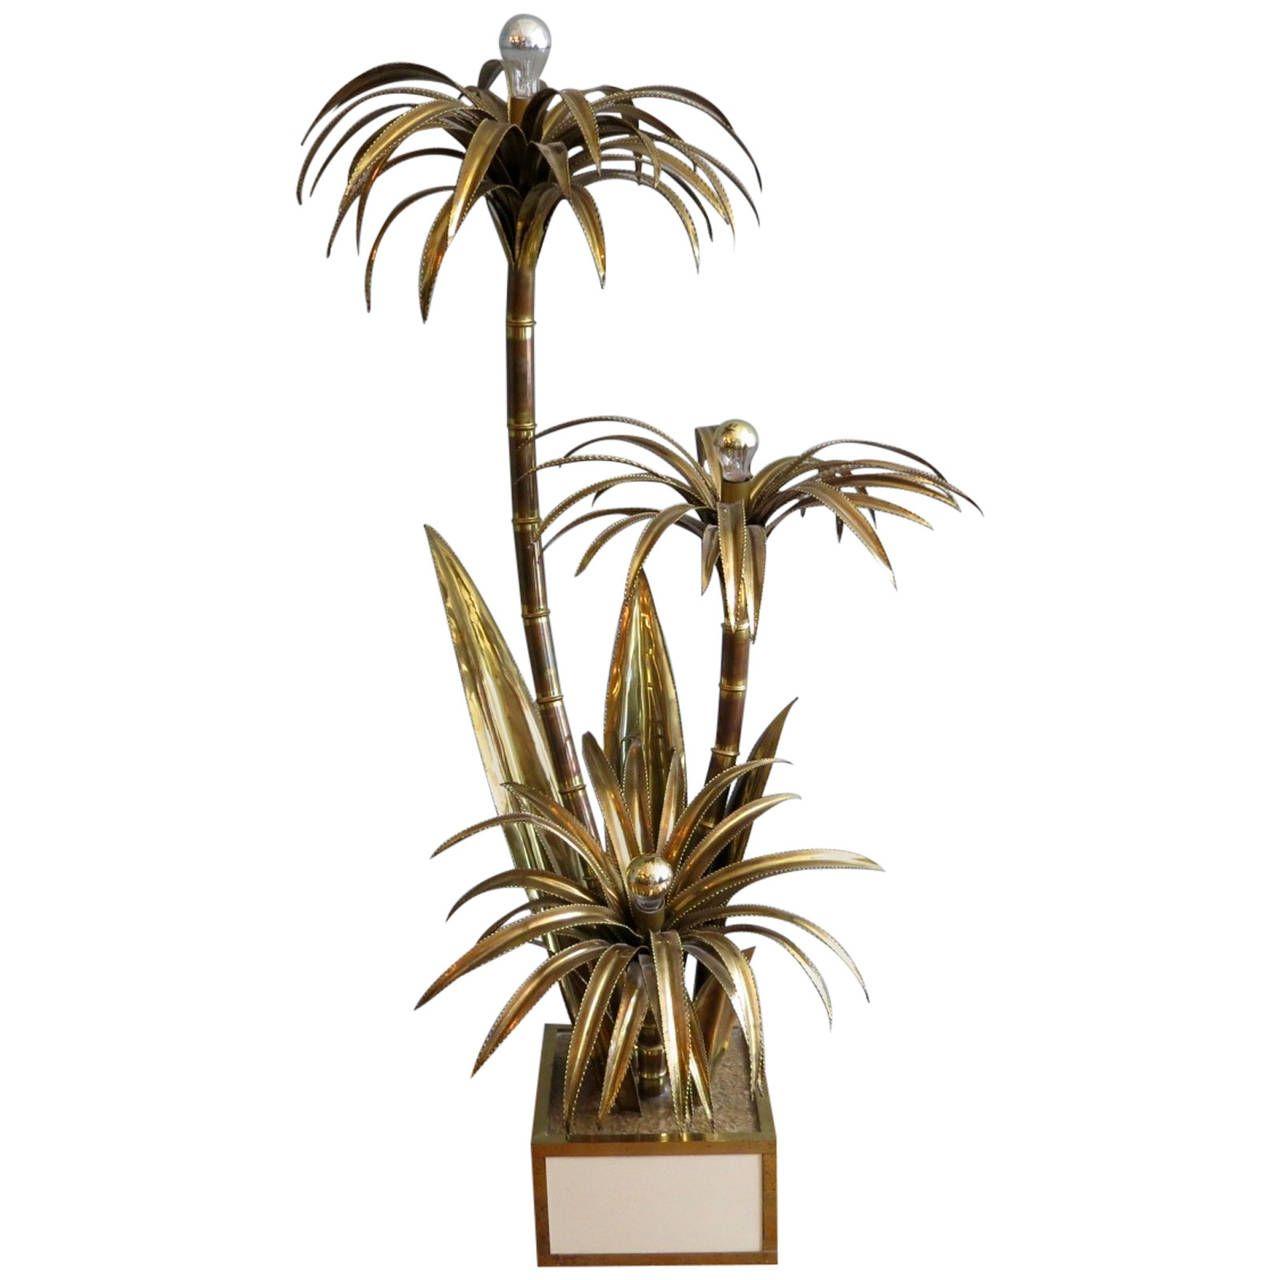 Brass palm tree floor lamp by maison jansen tree floor lamp brass palm tree floor lamp by maison jansen aloadofball Gallery